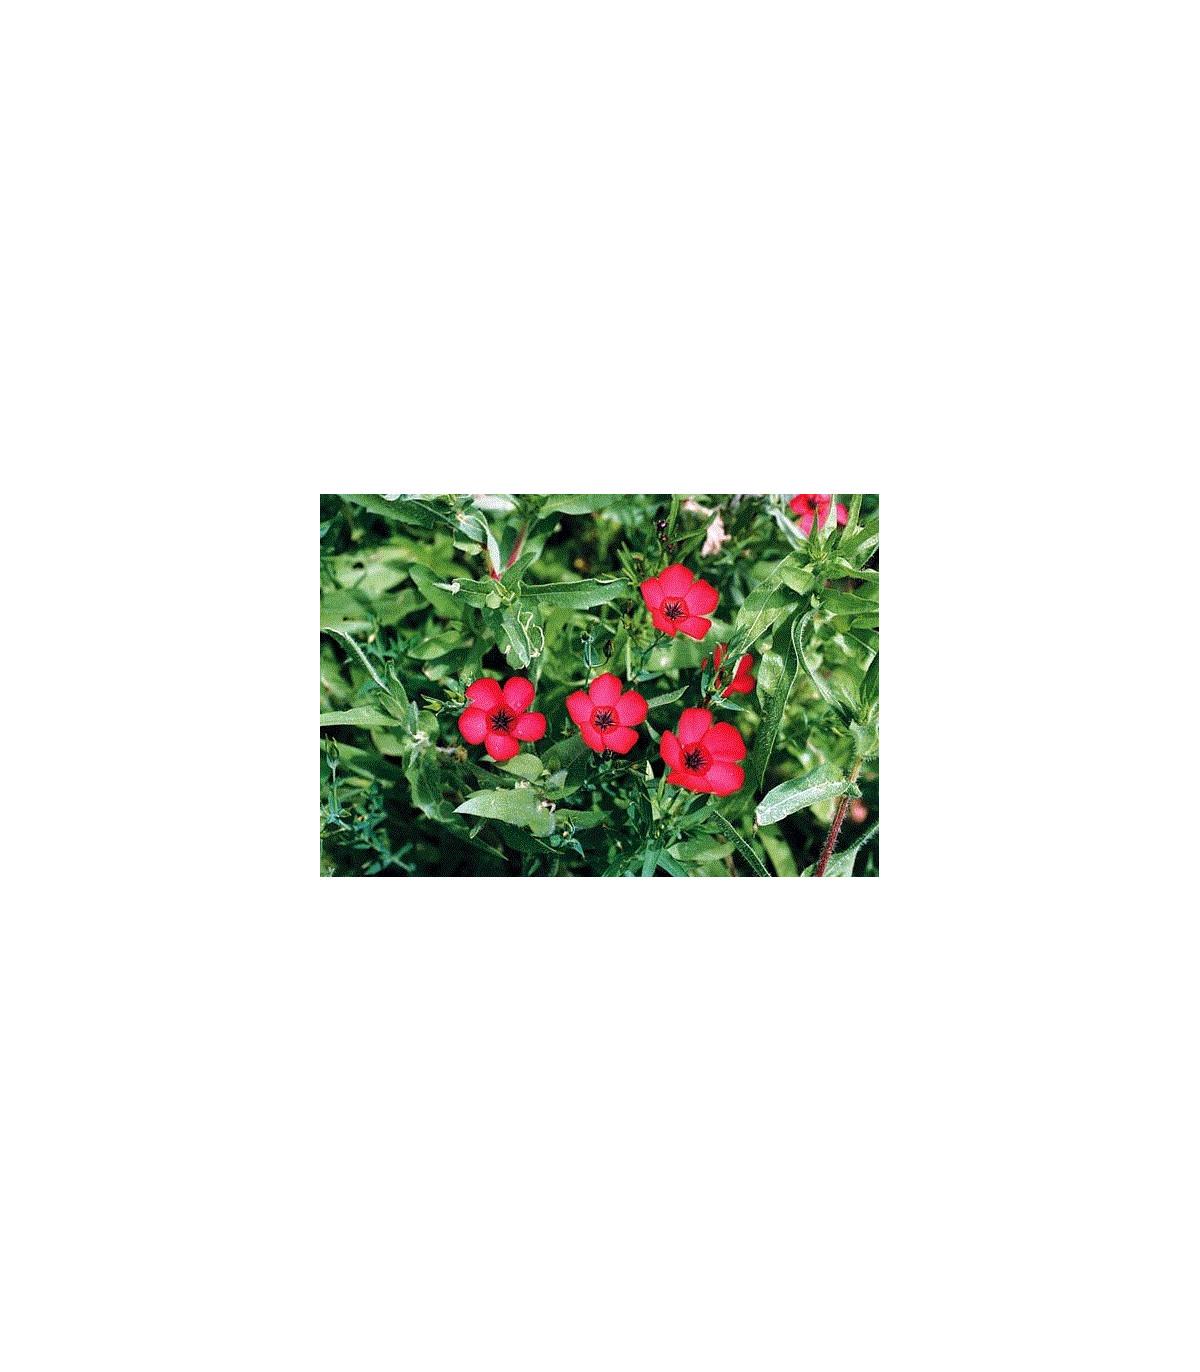 Ľan červený veľkokvetý - Linum grandiflorum - semená ľanu - semiačka - 1 g